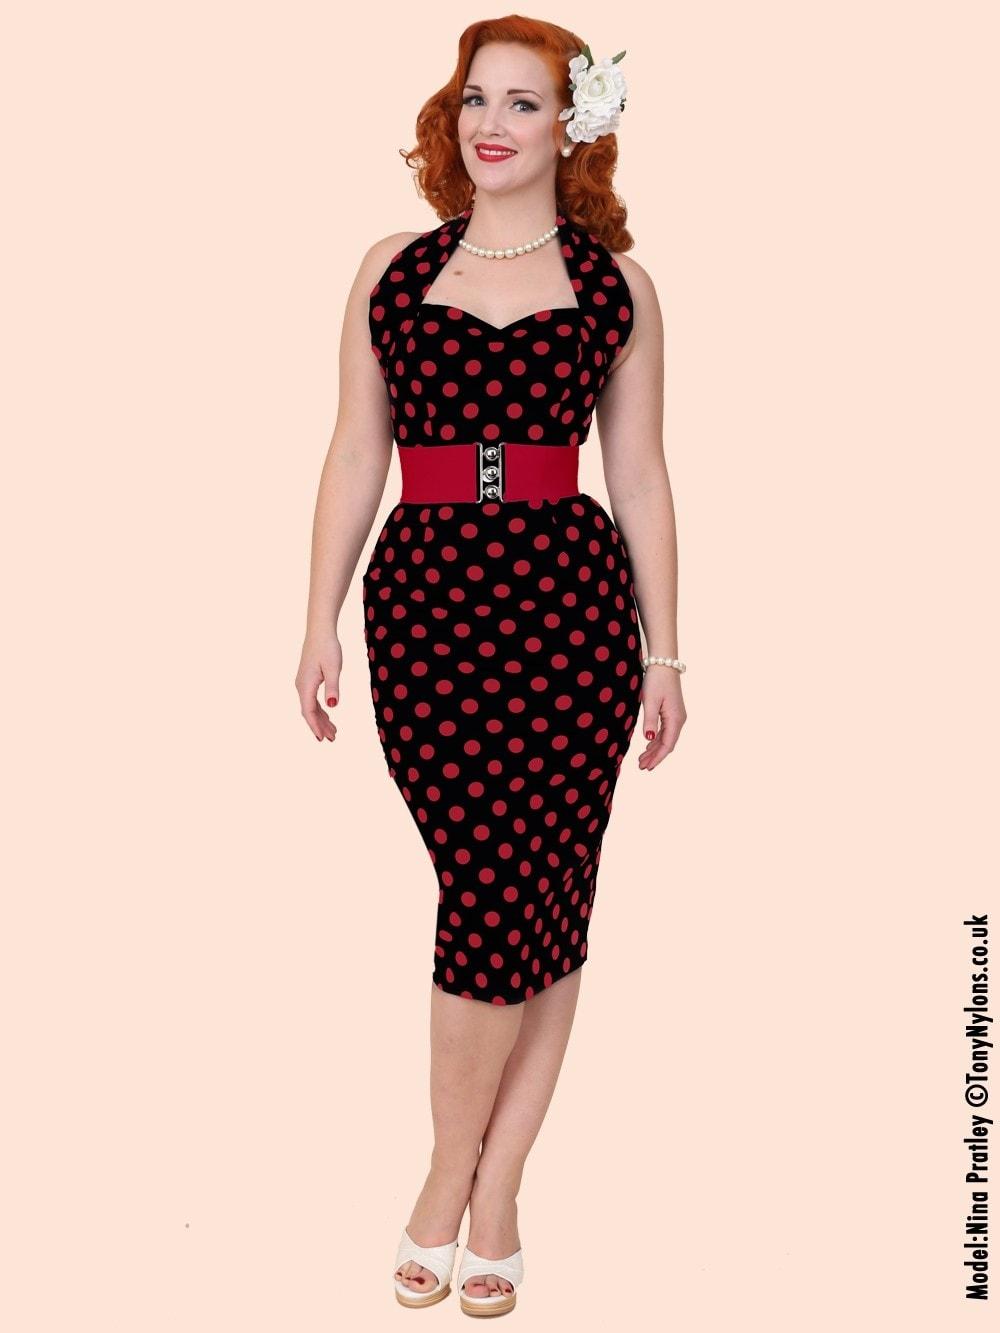 f7e6d9a7b9b 1950s Halterneck Pencil Dress Black Red Polka from Vivien of Holloway